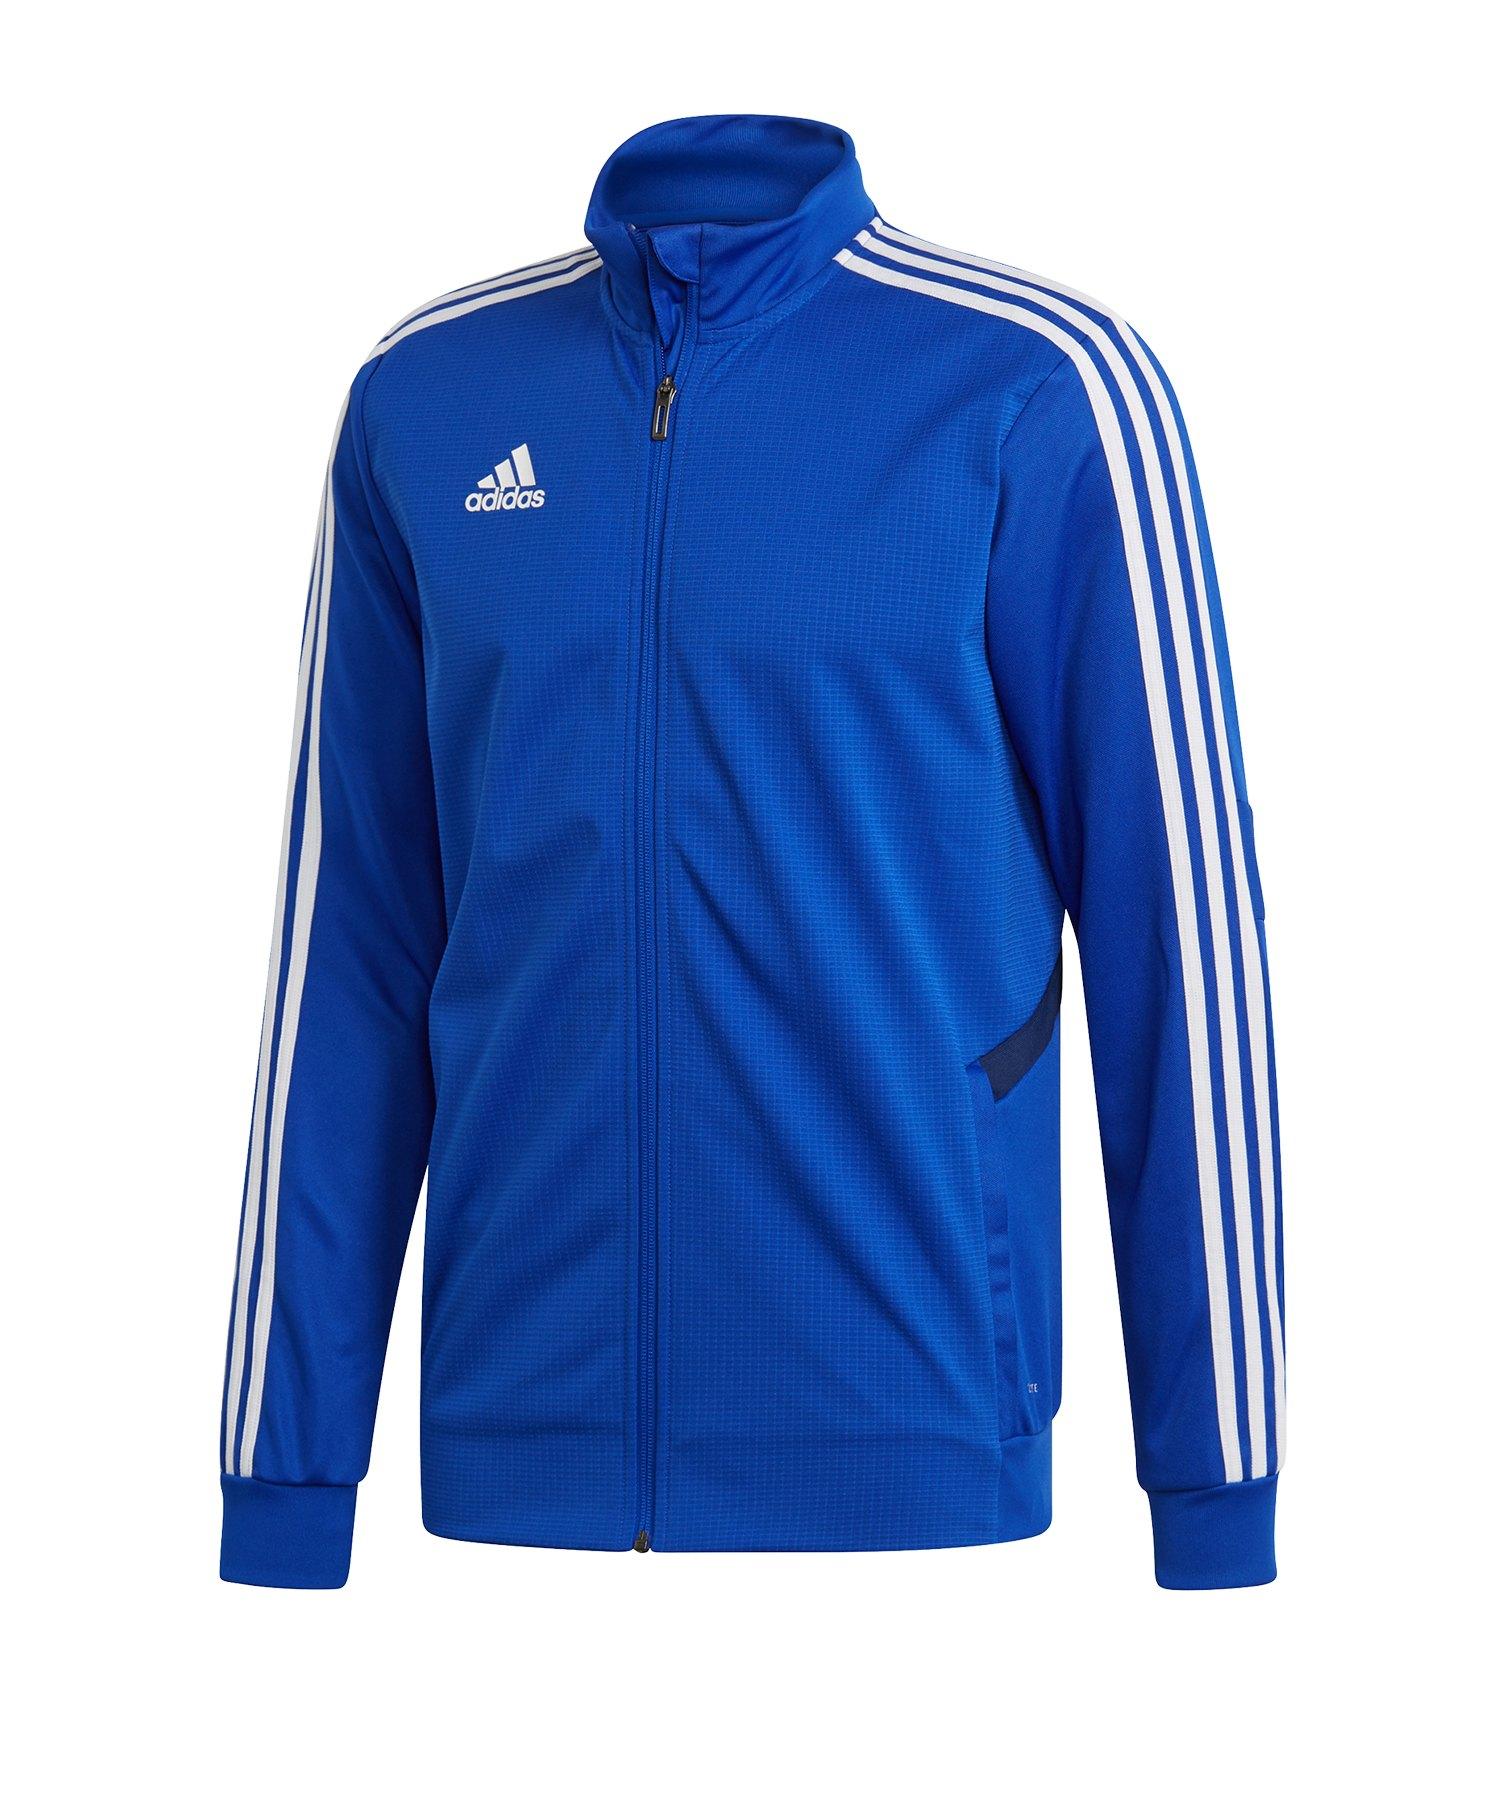 adidas Tiro 19 Trainingsjacke Blau Weiss